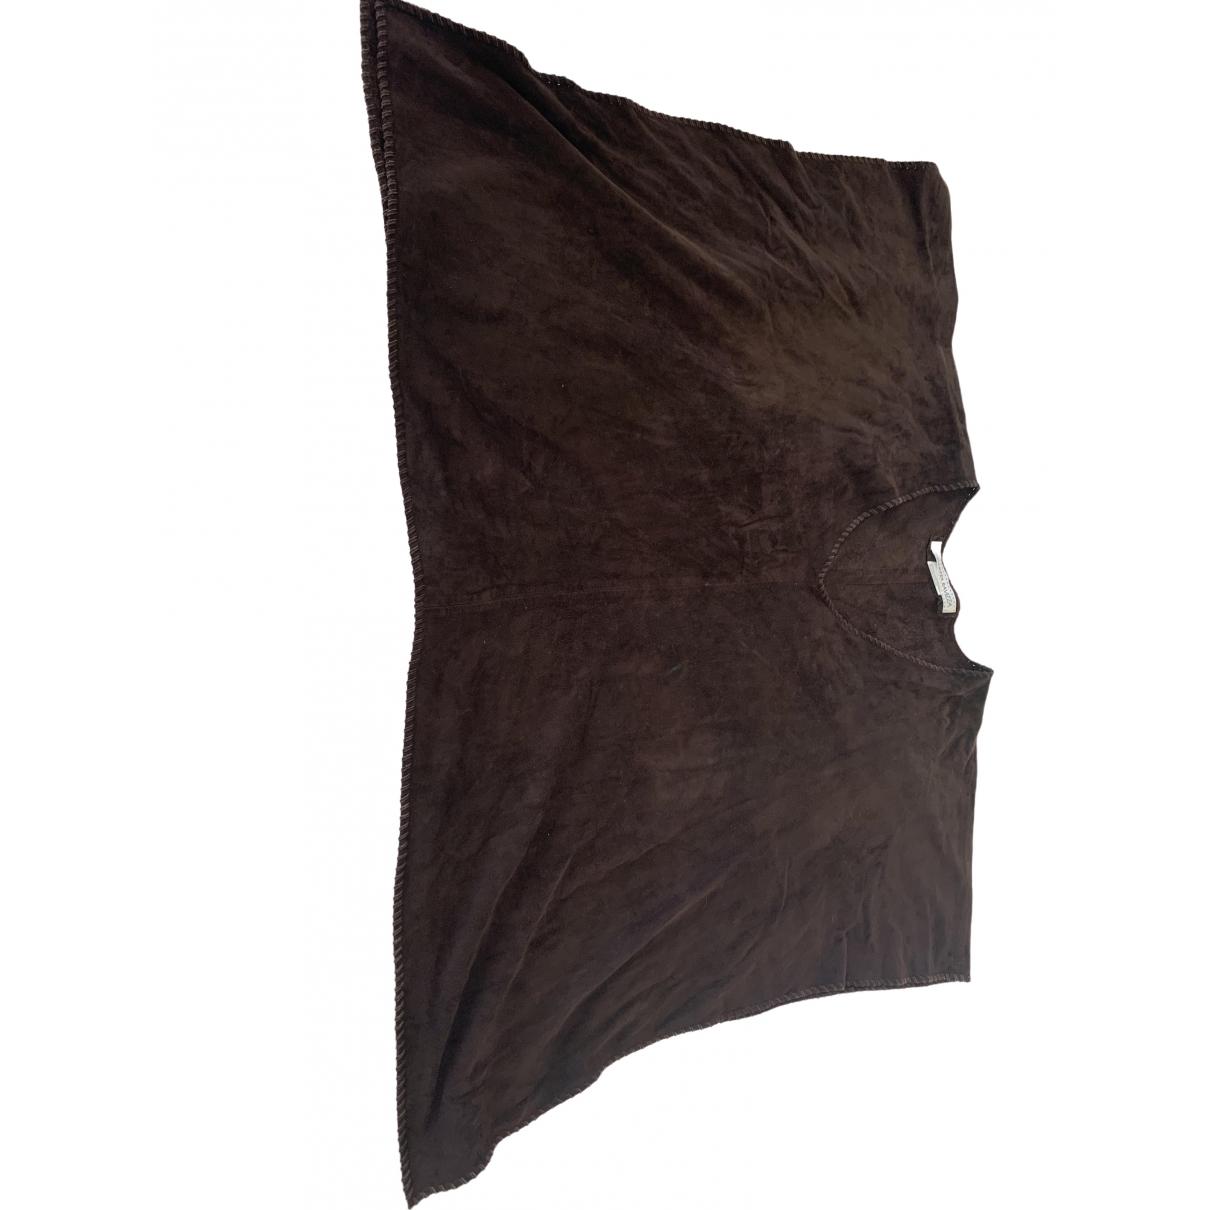 Simonetta Ravizza \N Brown Linen  top for Women One Size IT